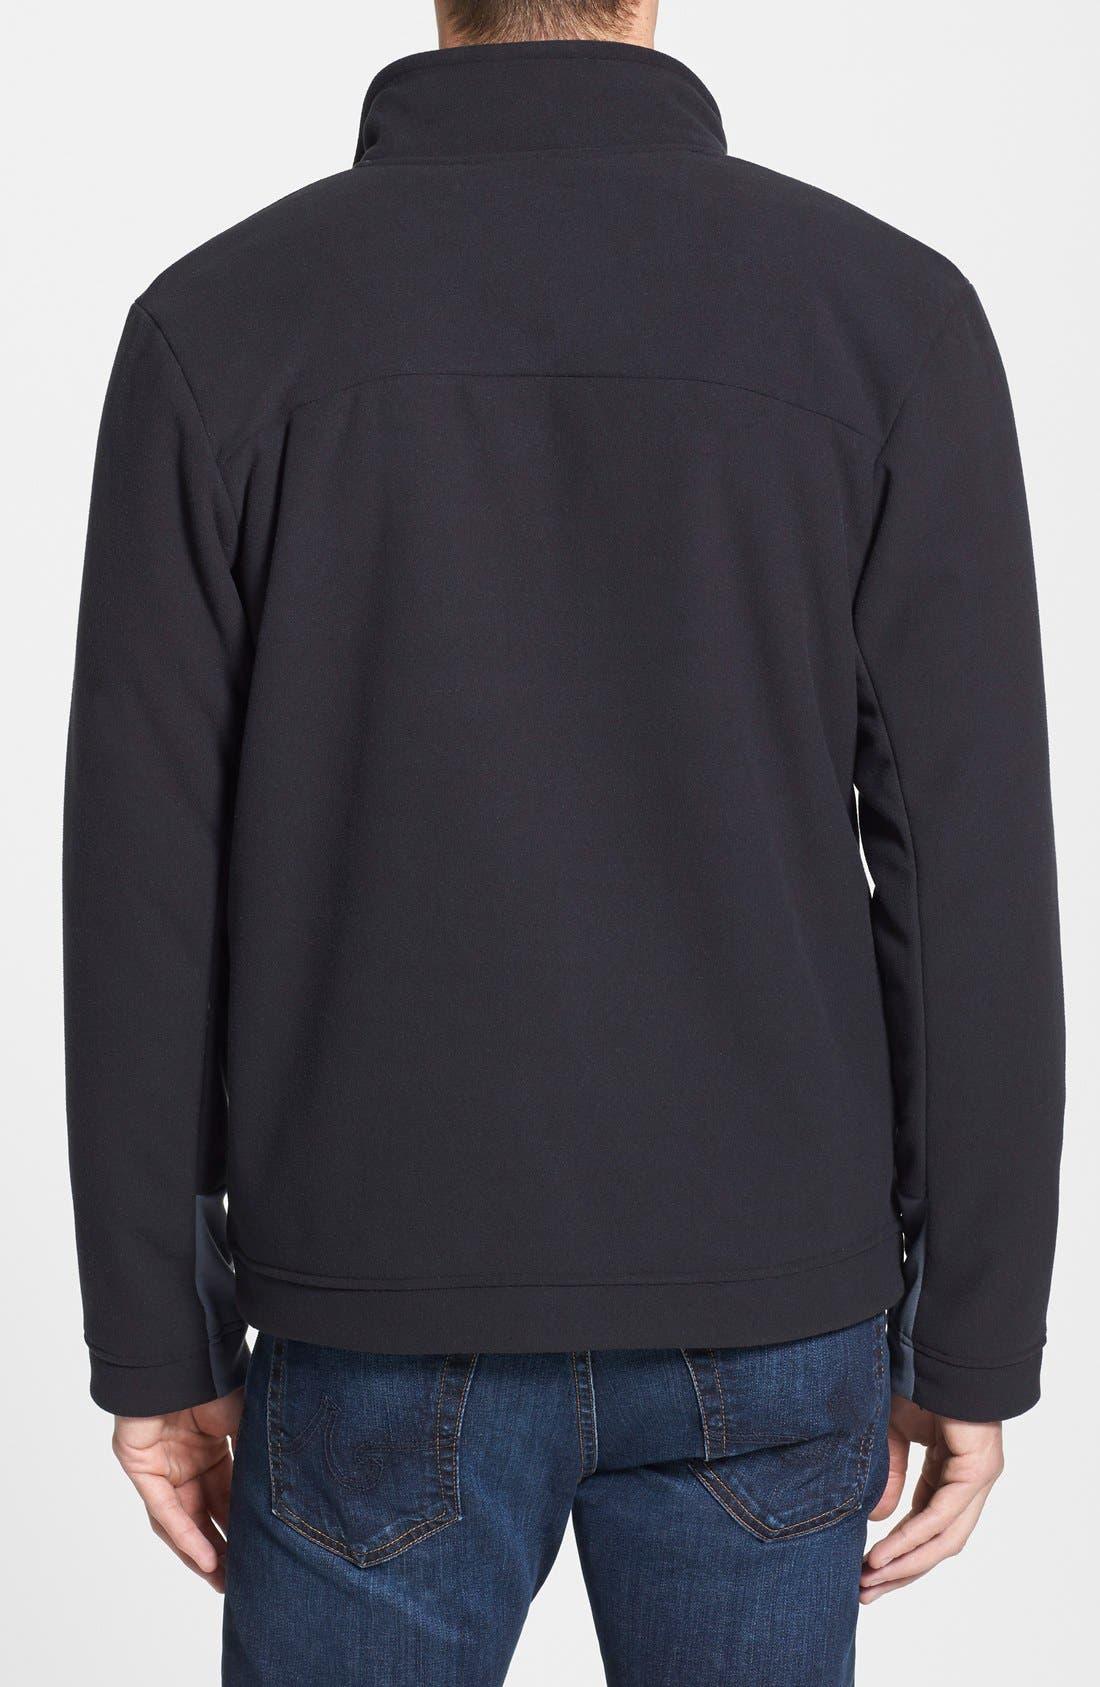 'Chimborazo' Zip Front Fleece Jacket,                             Alternate thumbnail 34, color,